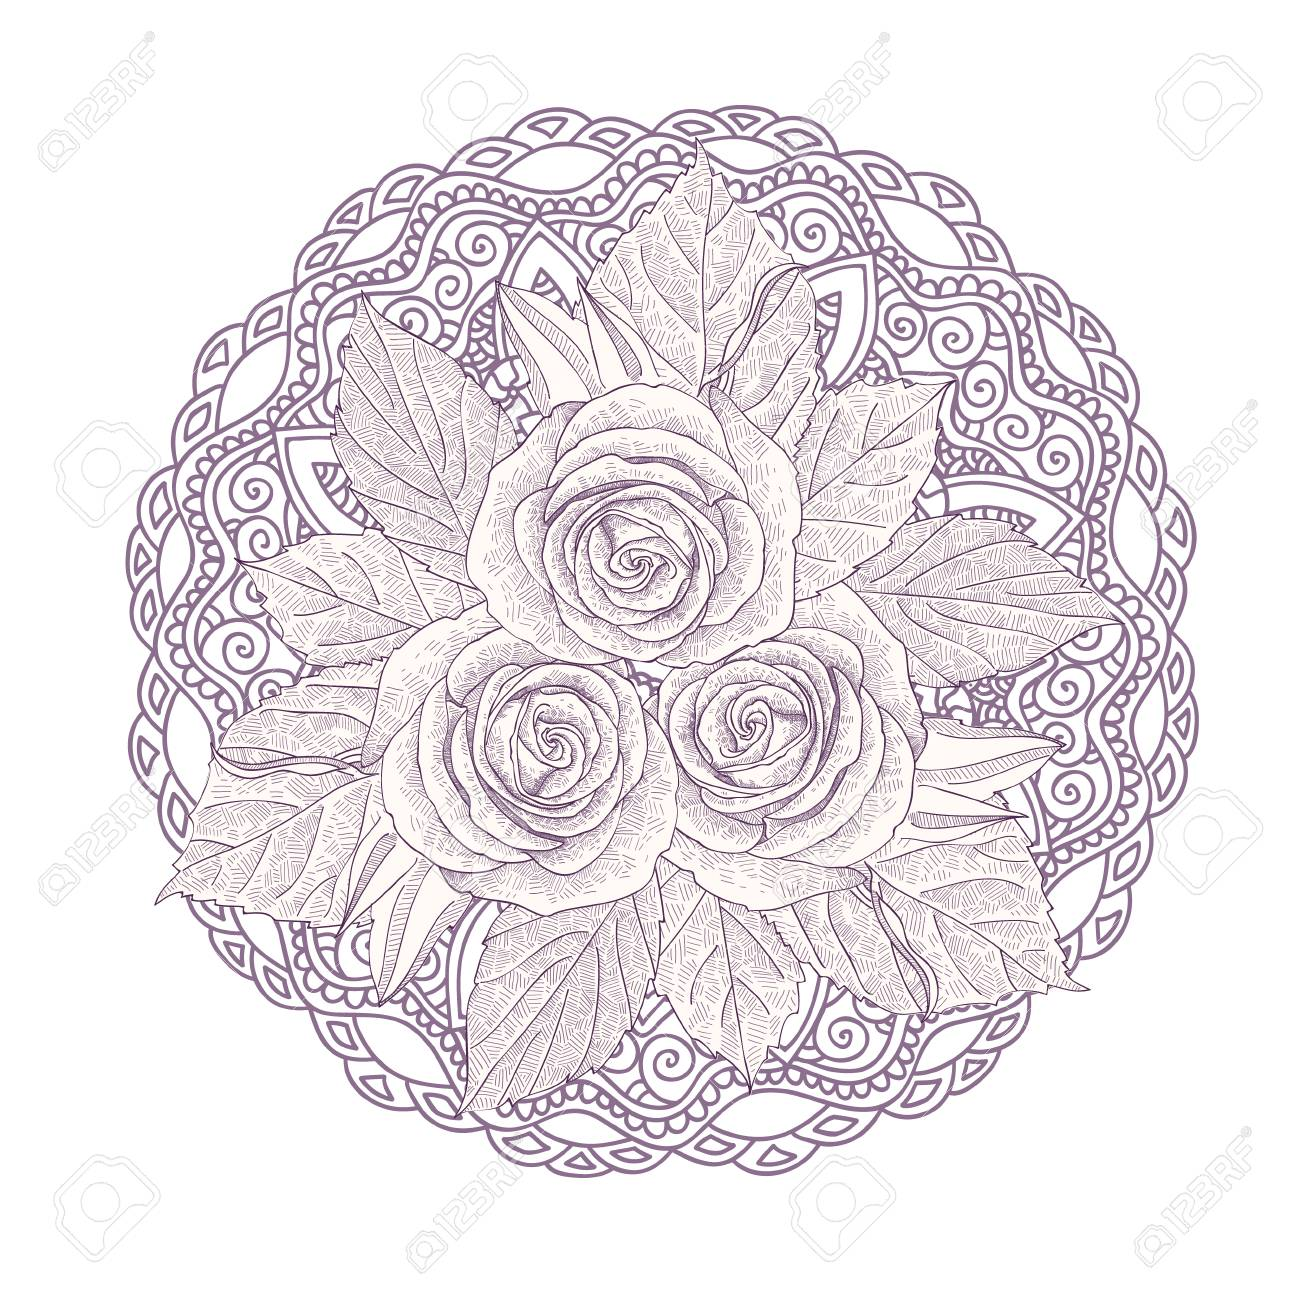 Mandala With Bouquet Of Three Roses Isolated On White Background ...